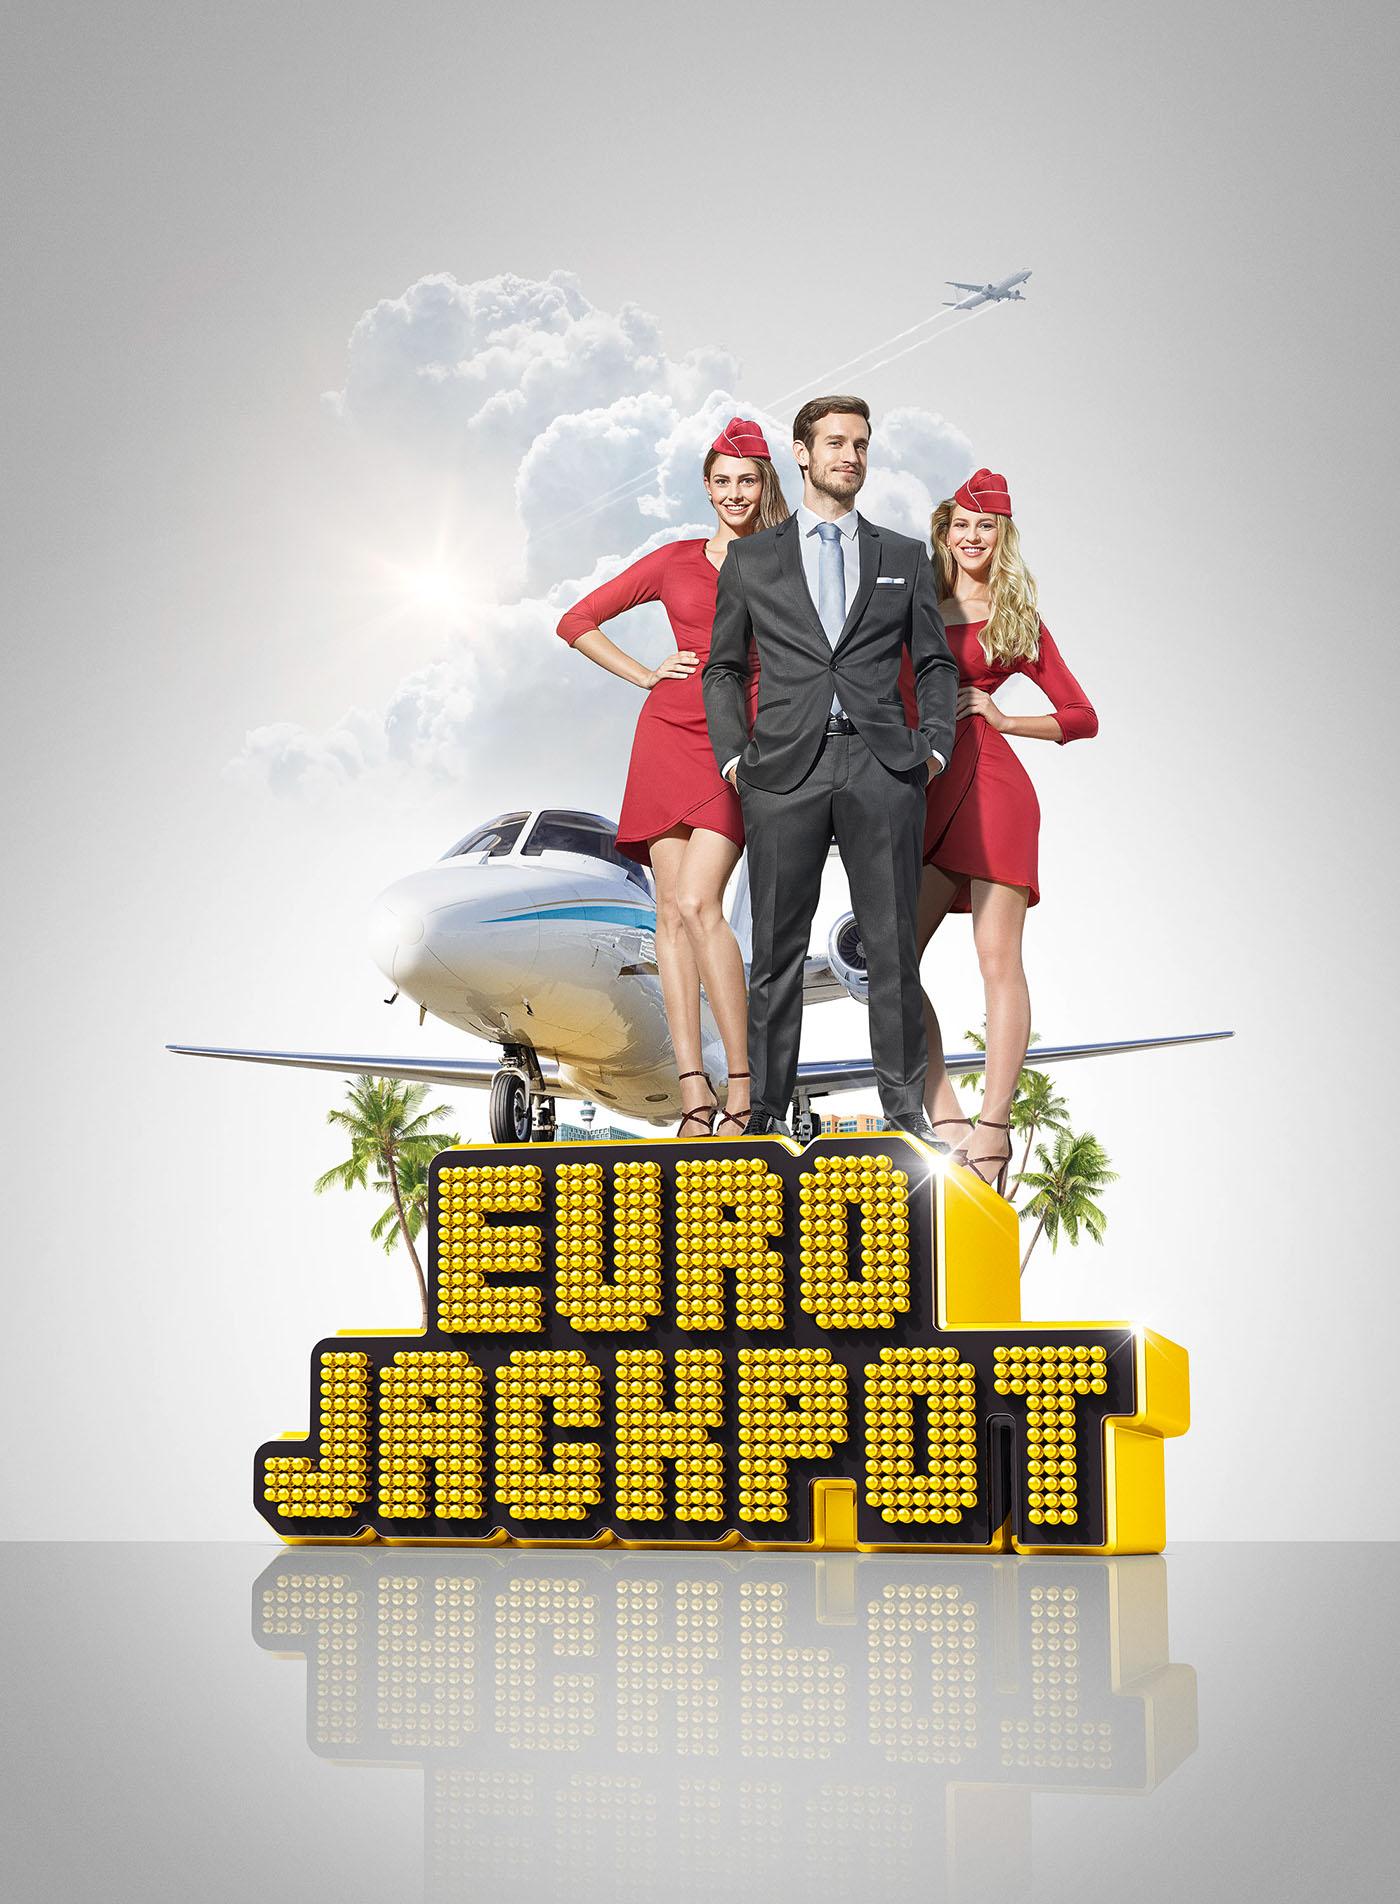 Euro Jackpoz